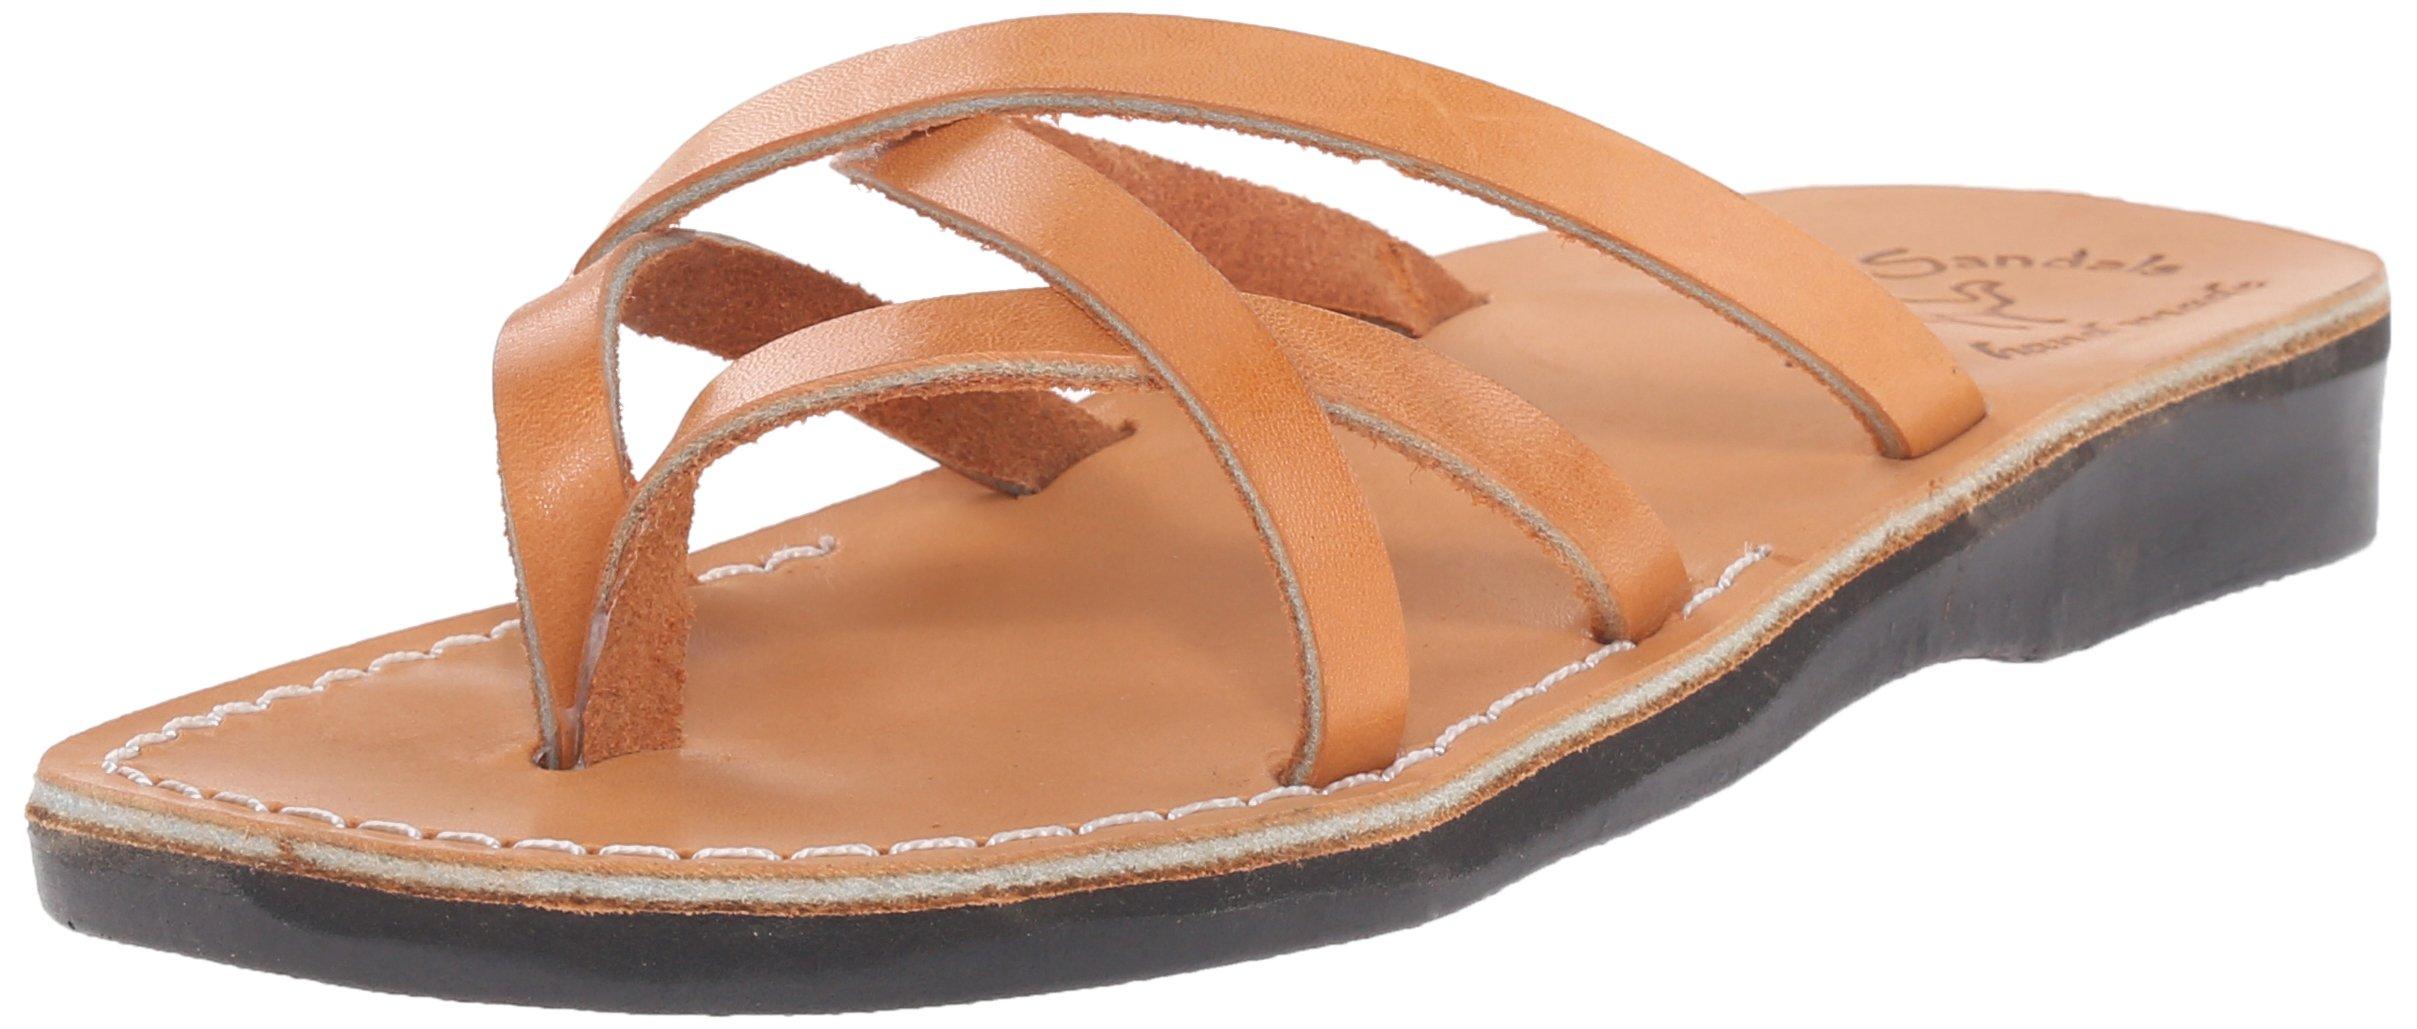 Jerusalem Sandals Women's Tamar Slide Sandal, Tan, 39 EU/8 M US by Jerusalem Sandals